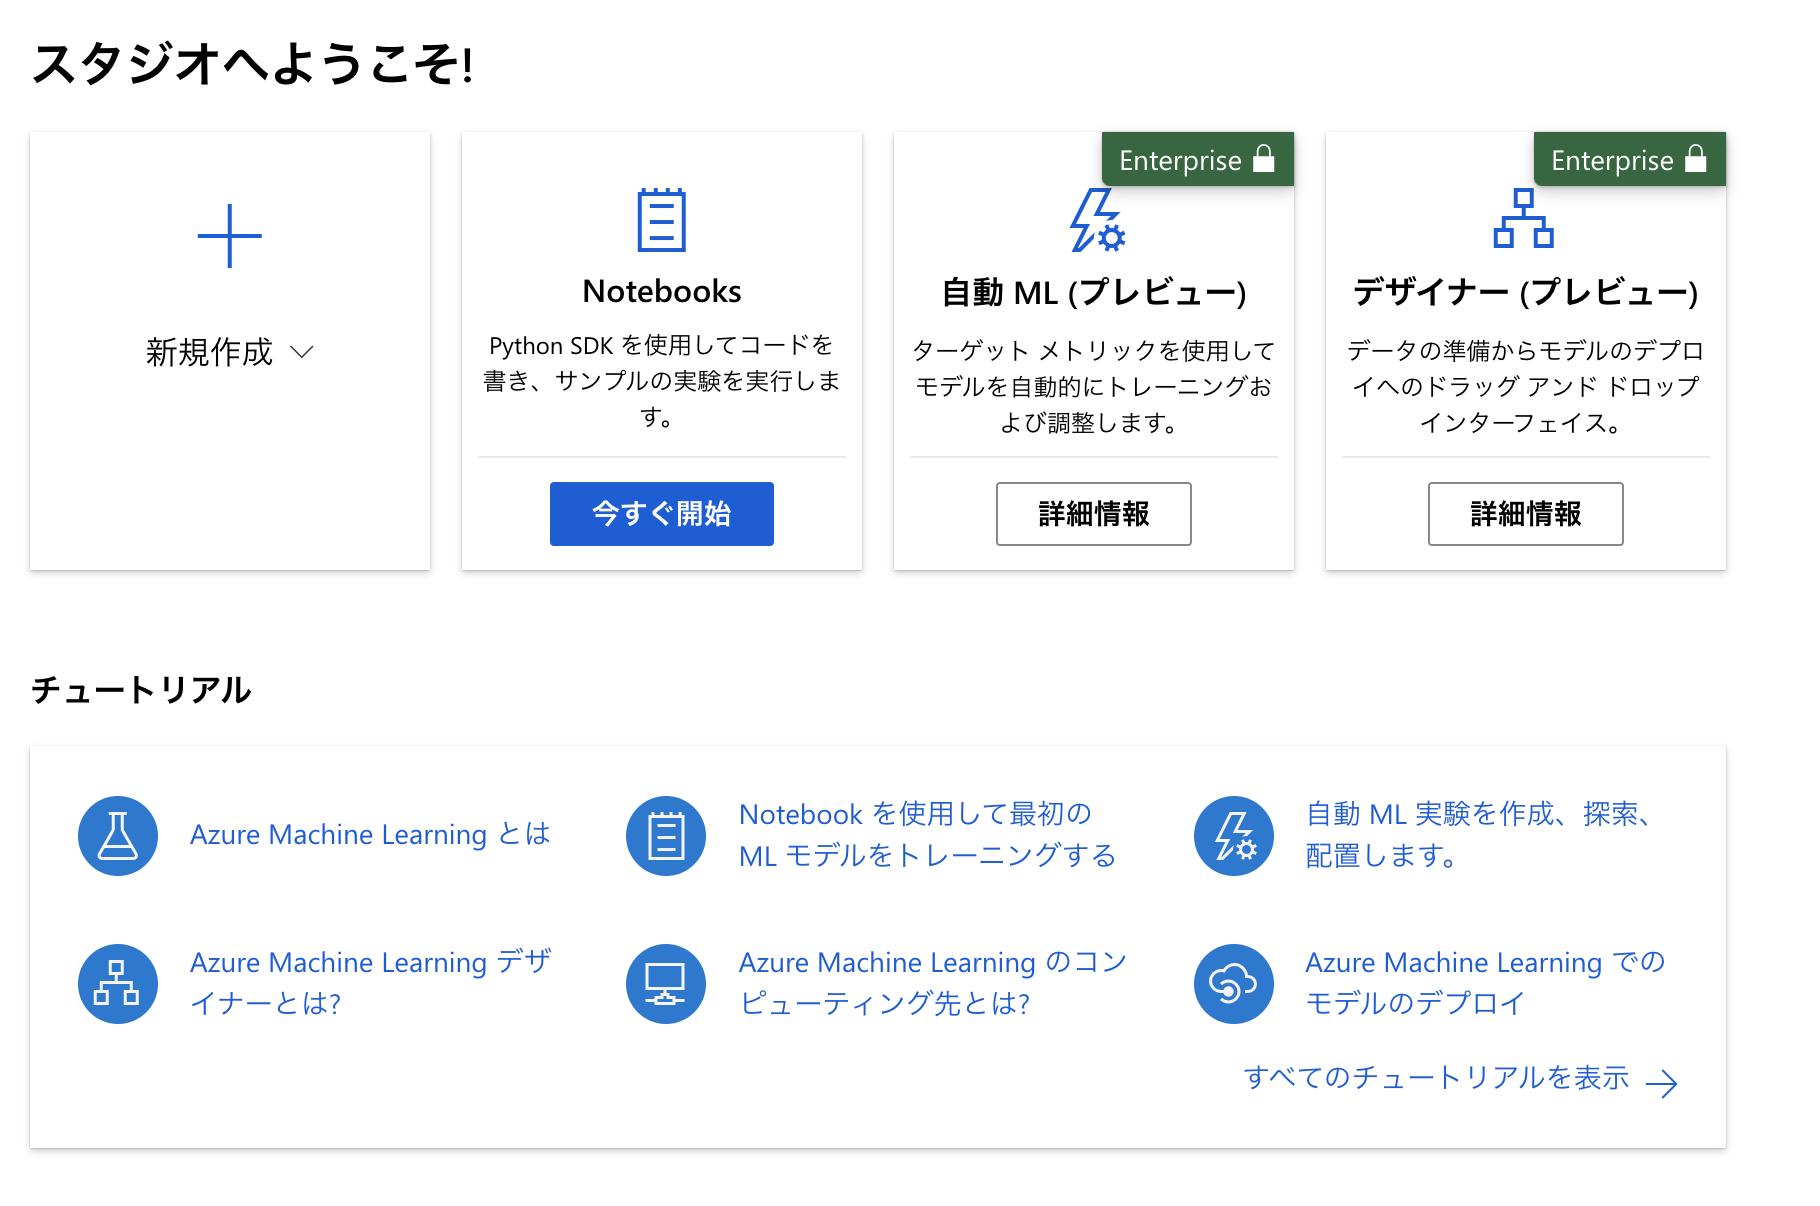 Azure Machine Learning Studioへアクセス